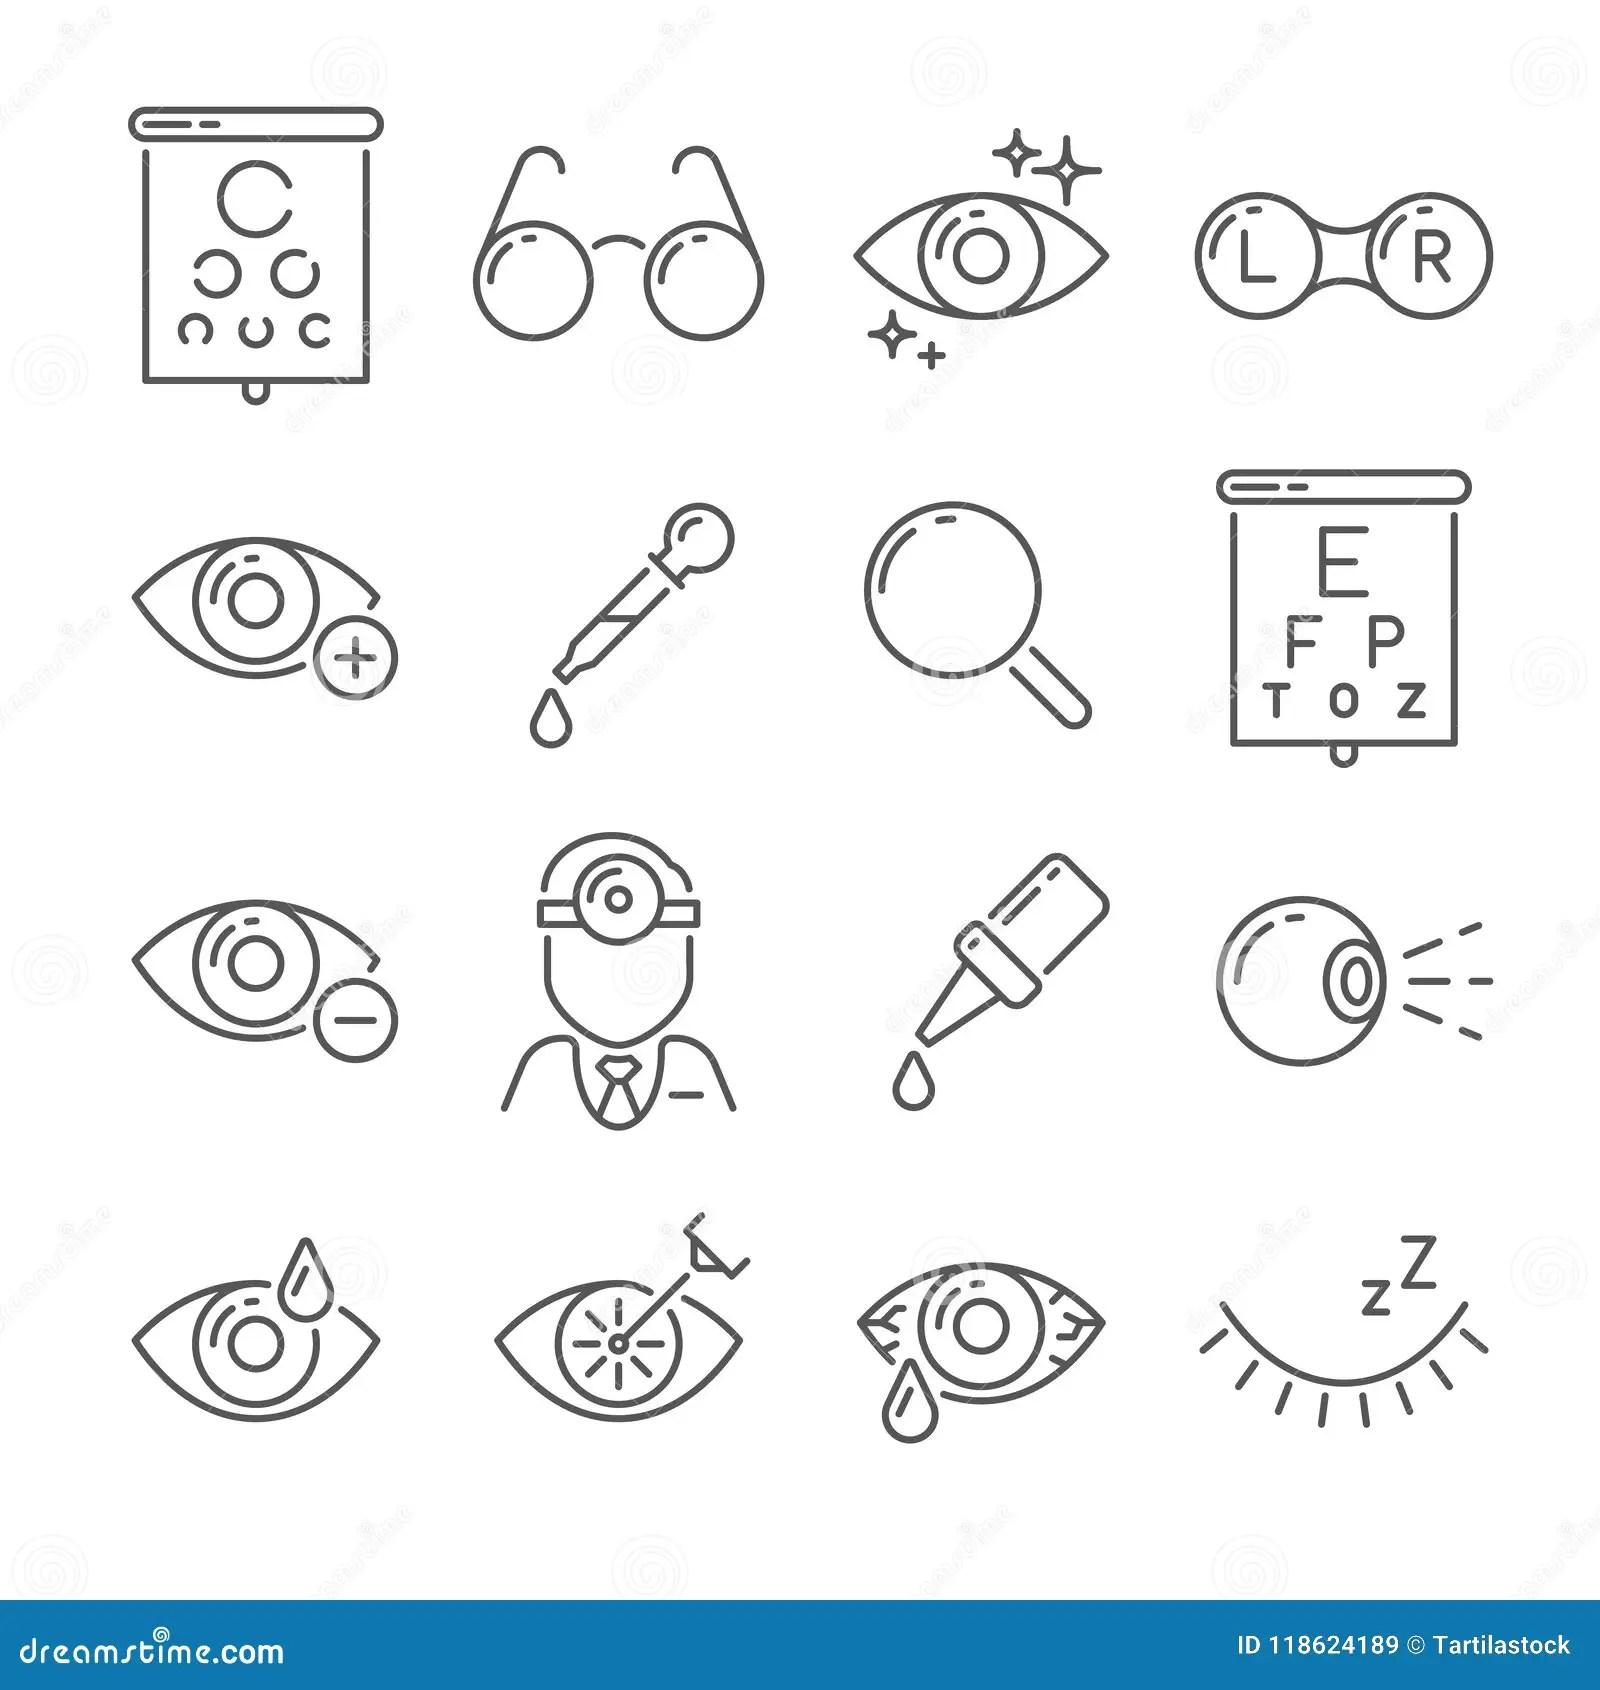 The Eye Or Eyeball Health Care Education Infographic